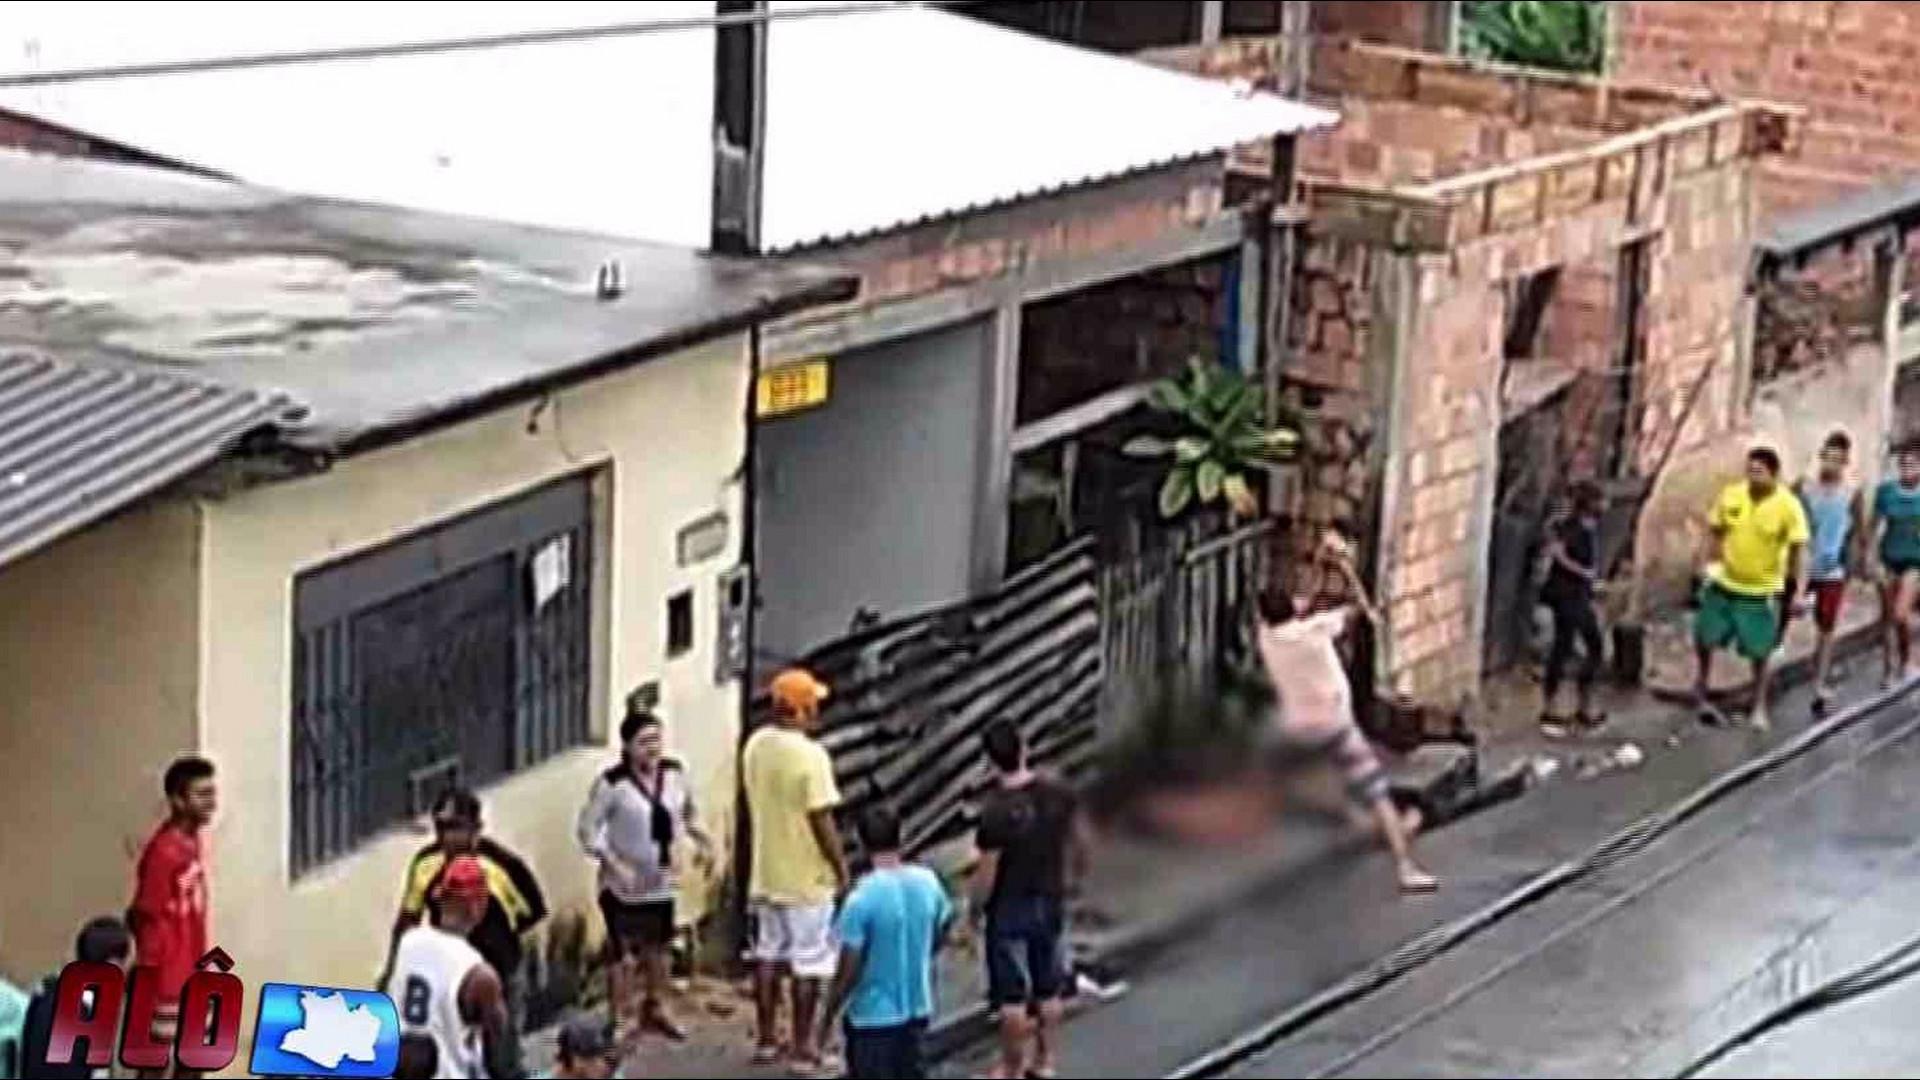 VINGANÇA: JOVEM É PRESO TEMPORARIAMENTE APÓS MATAR PADRASTO - Alô Amazonas - 19/10/17